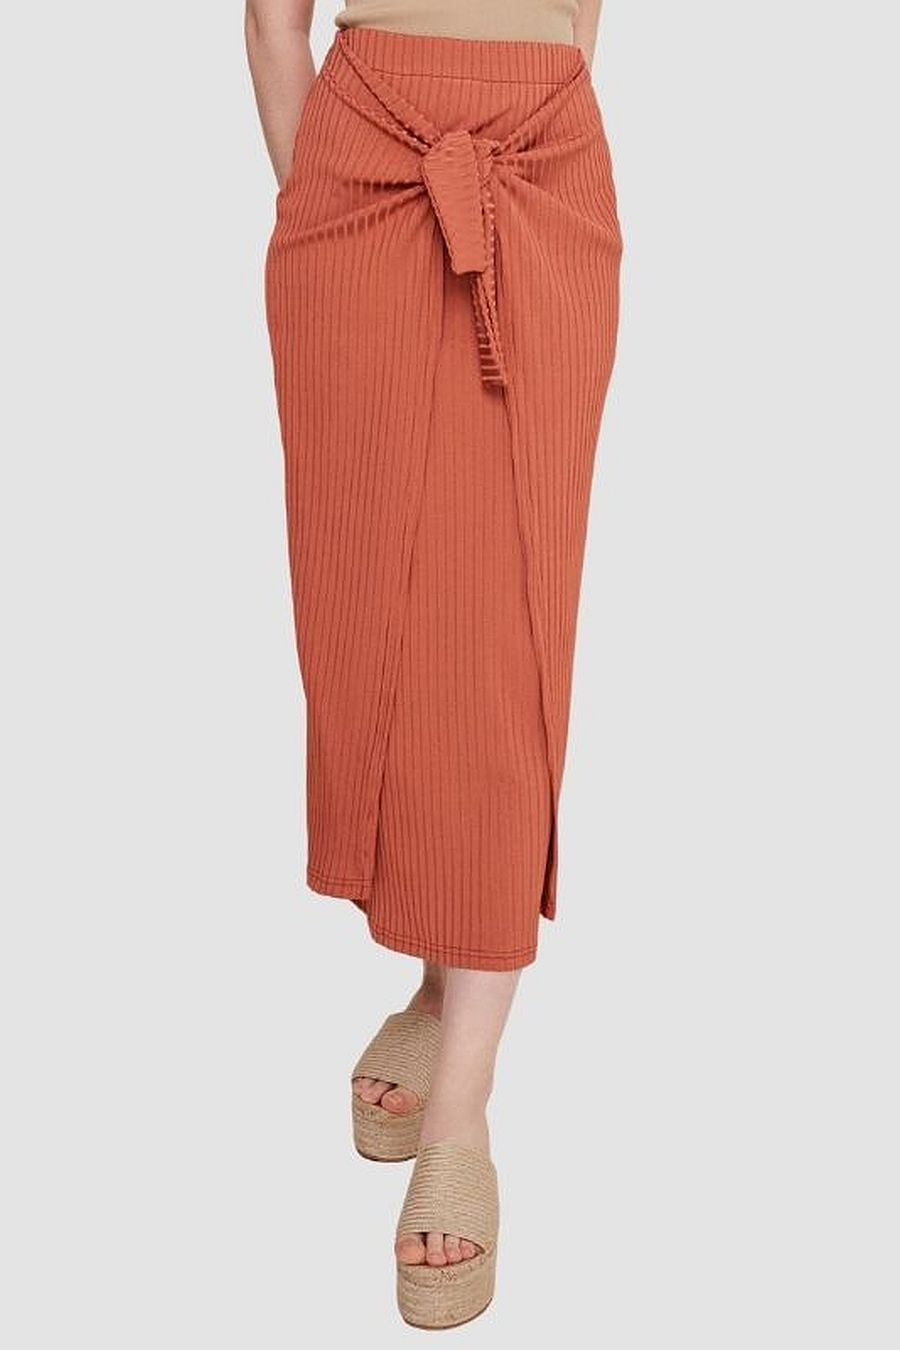 Rita Row Venus Skirt